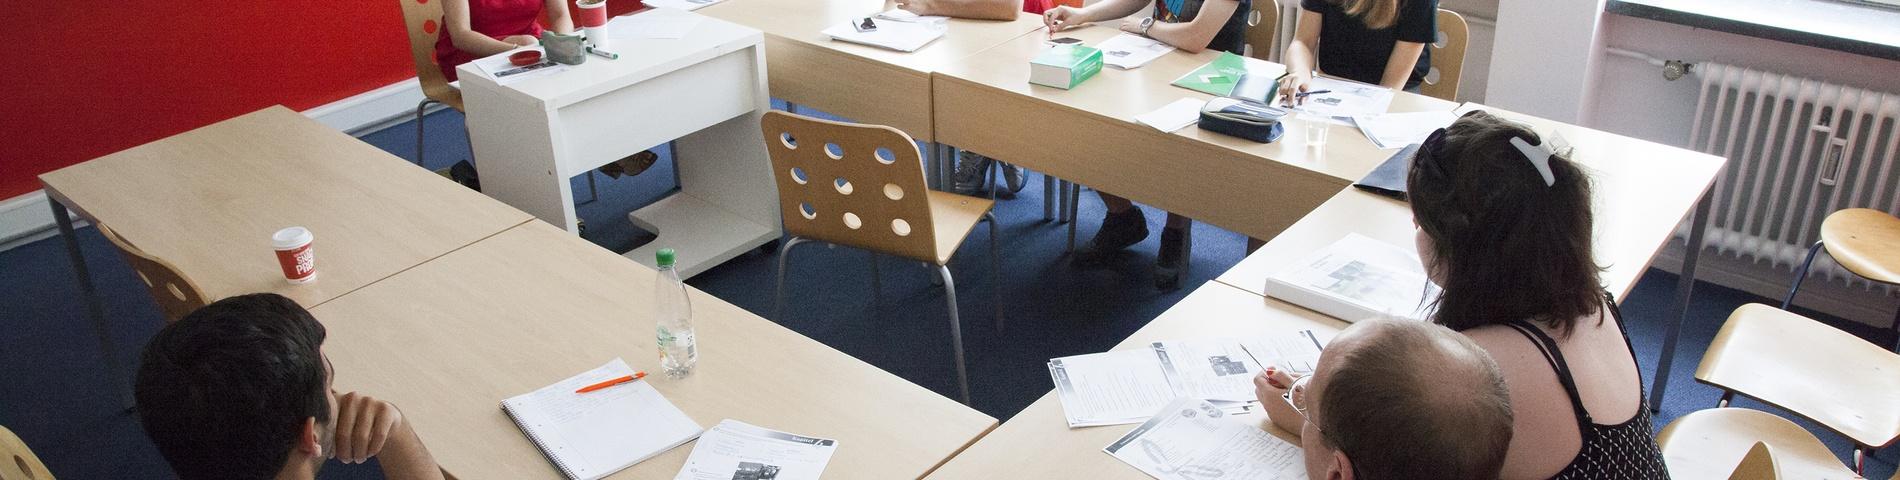 Berlin Sprachschule picture 1